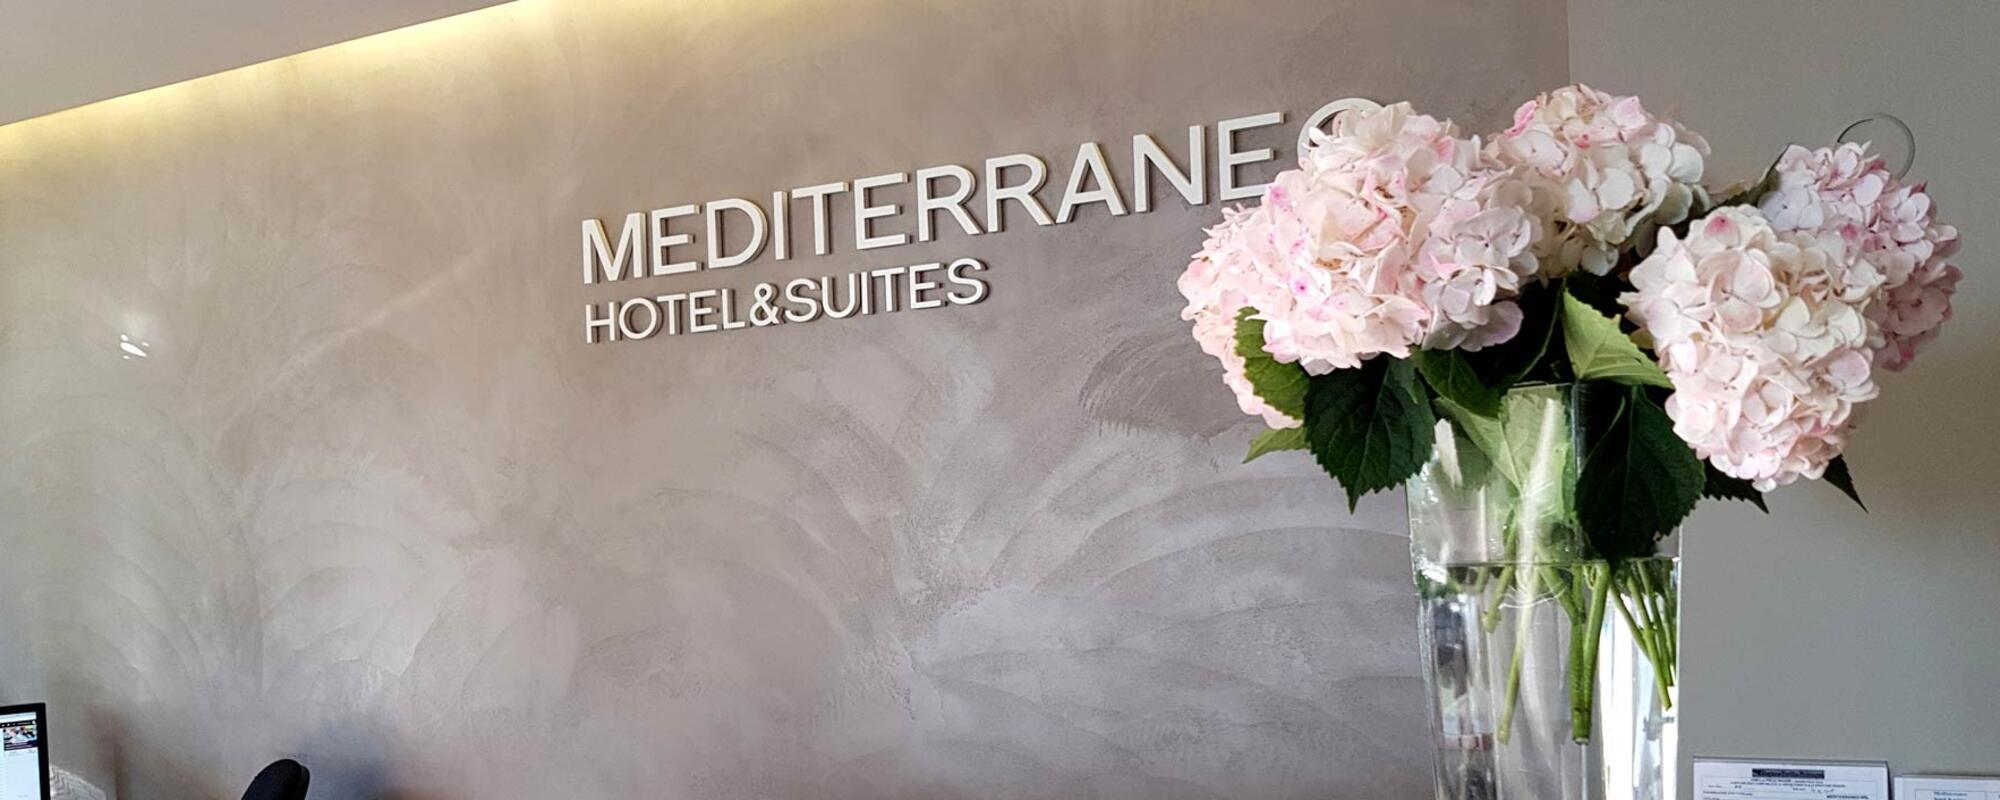 hotelmediterraneocattolica it home 013